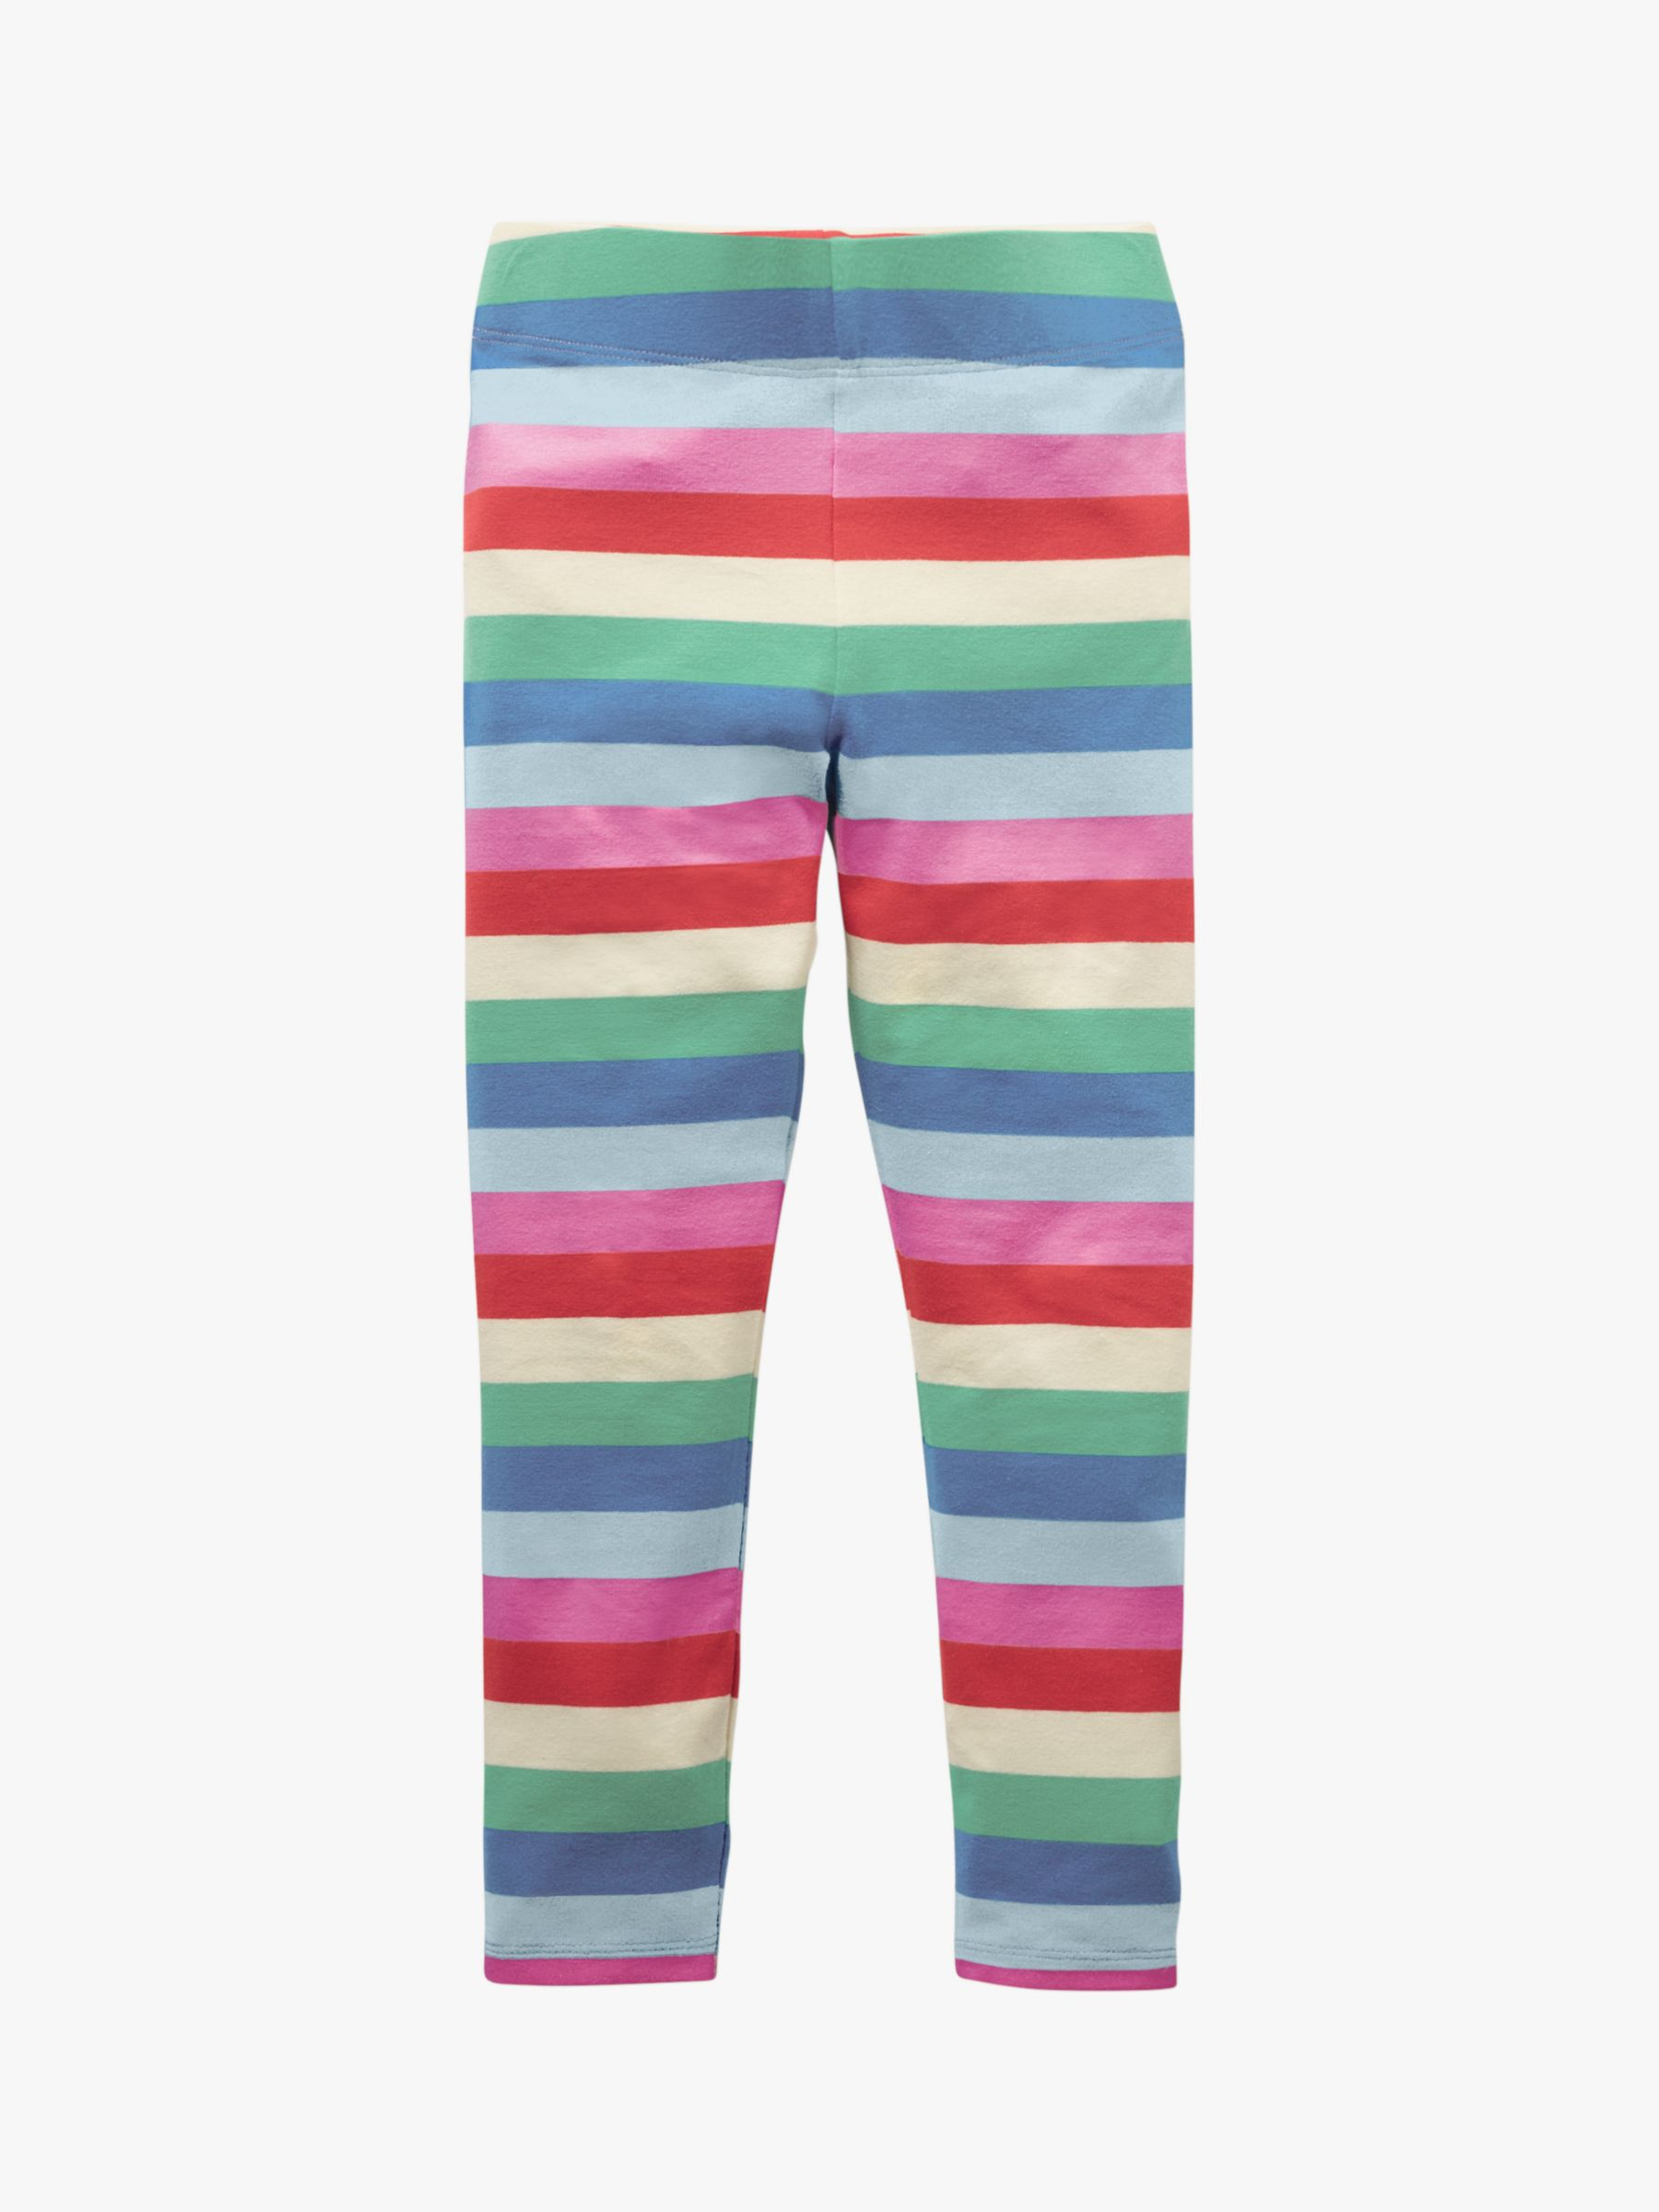 Mini Boden Mini Boden Girls' Fun Rainbow Leggings, Multi